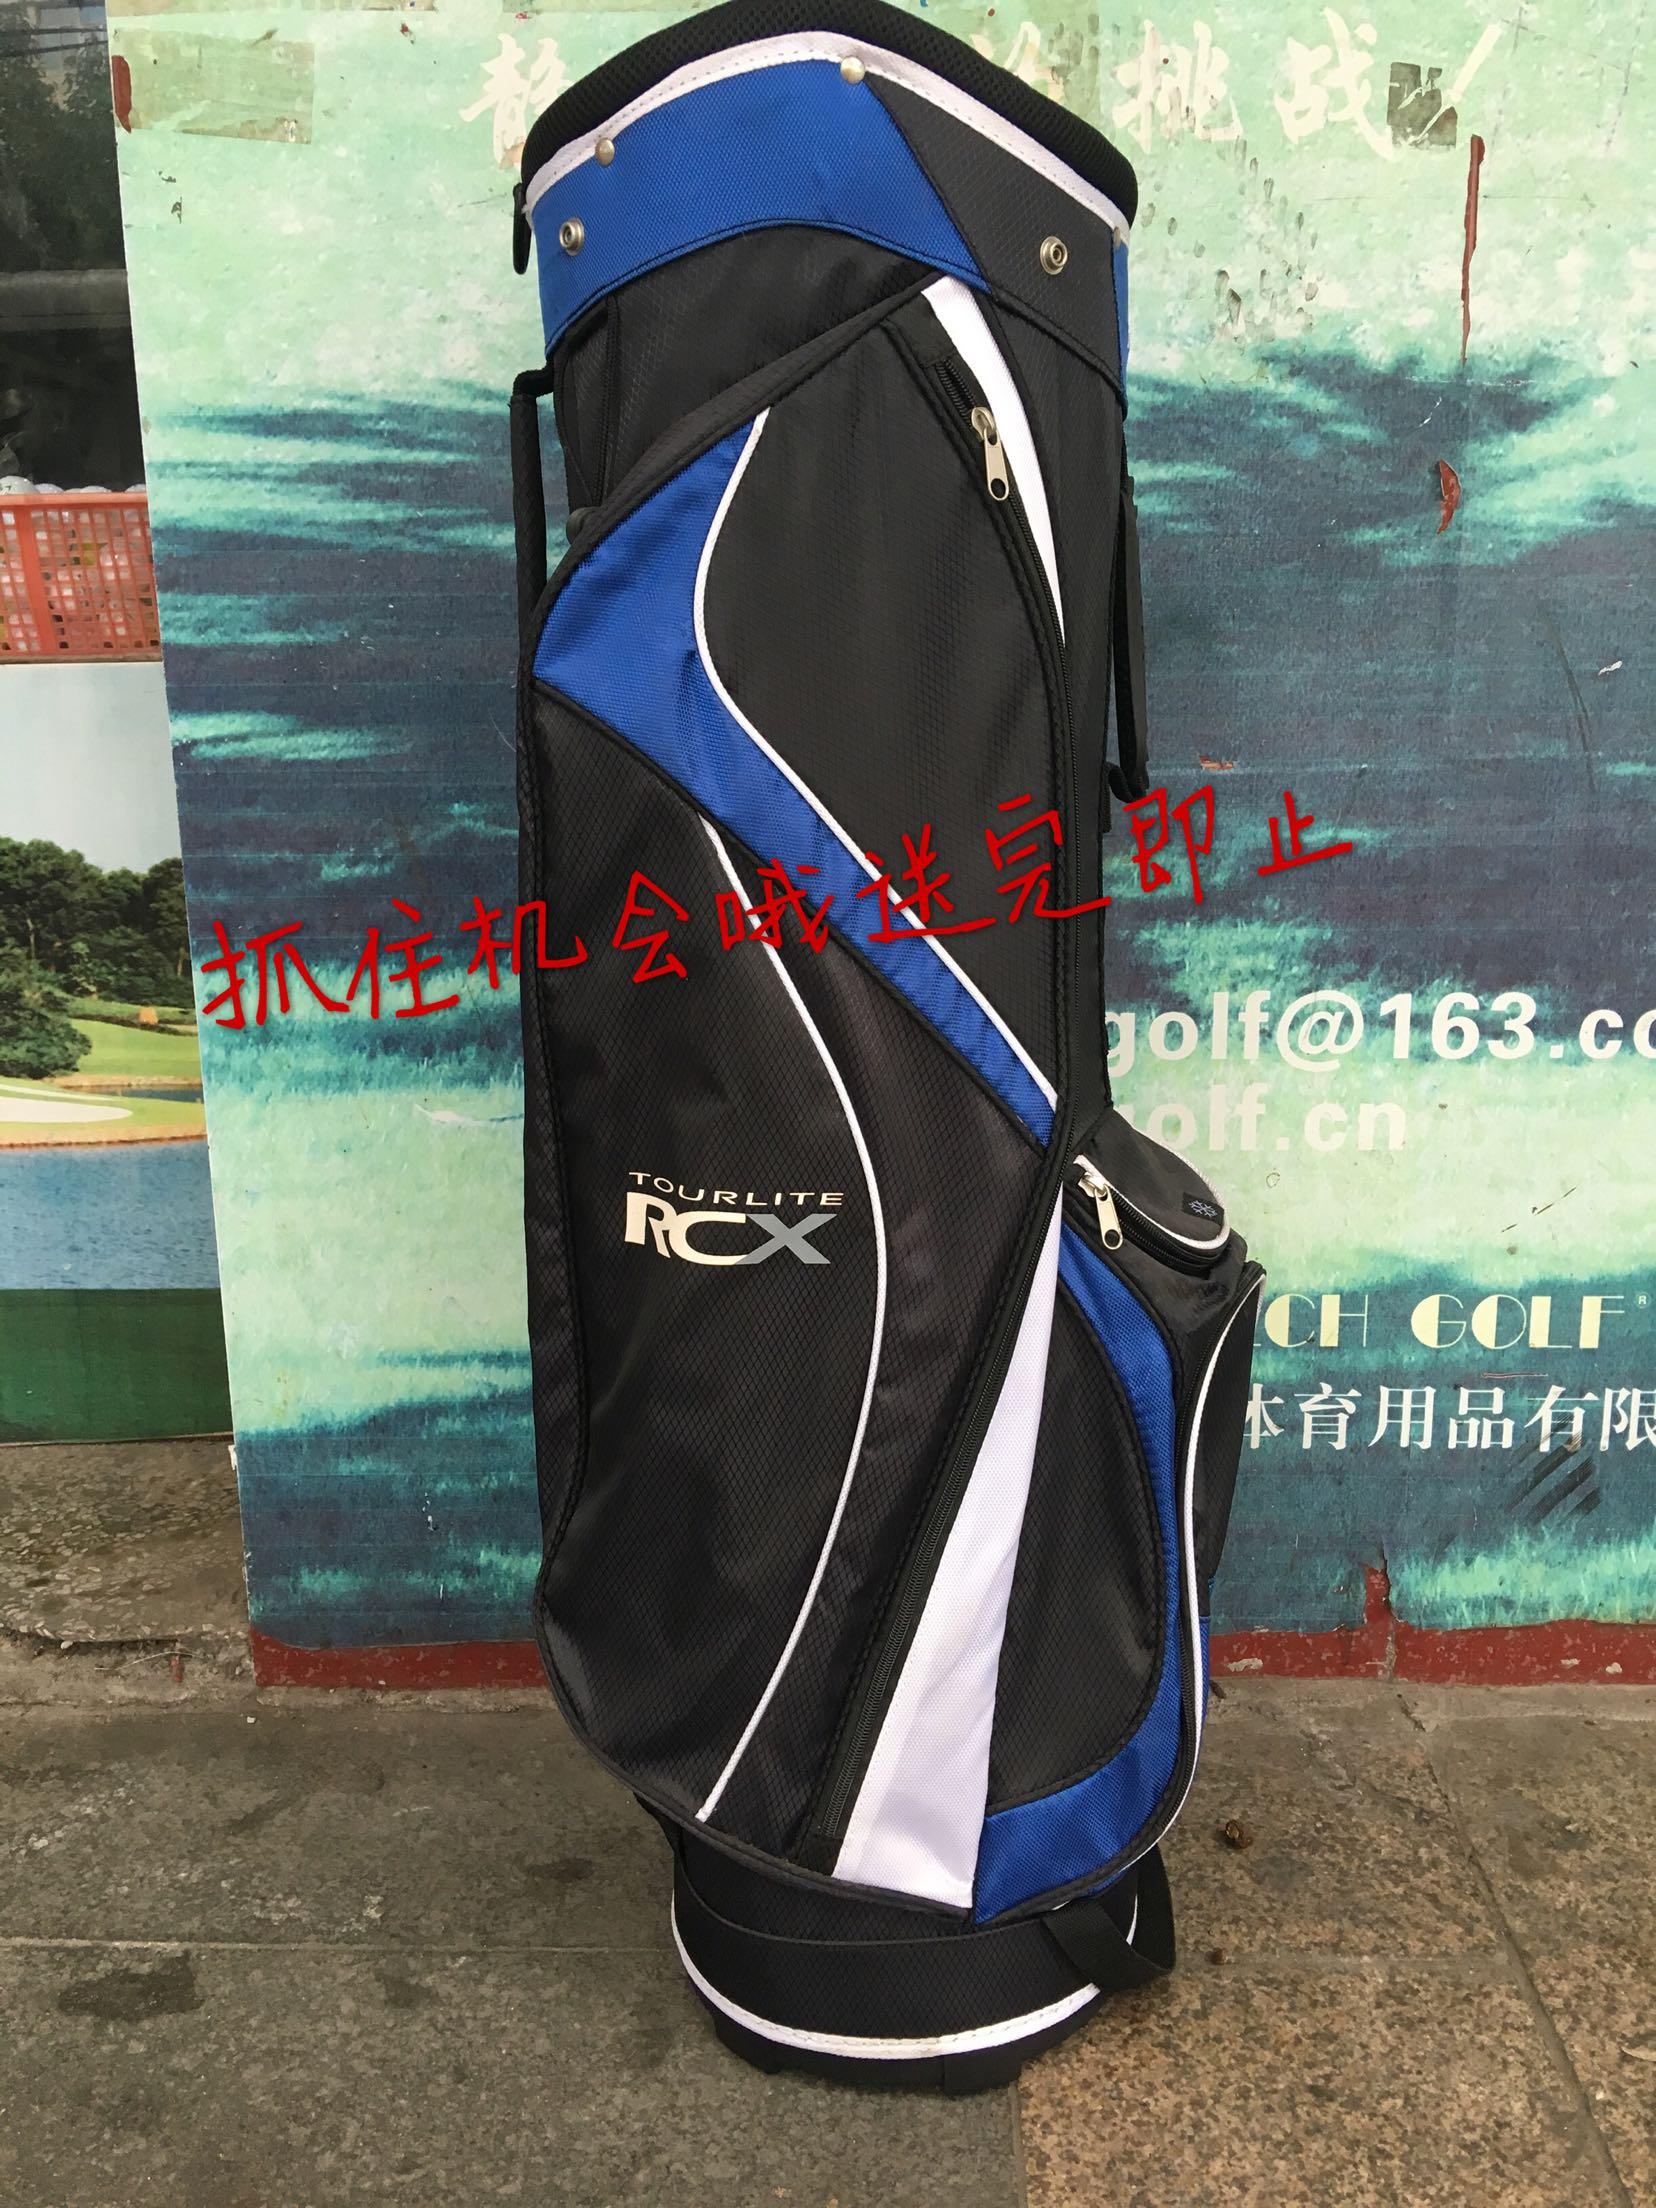 Special golf standard for men and women, full cloth wear resistant golf bag for men and women